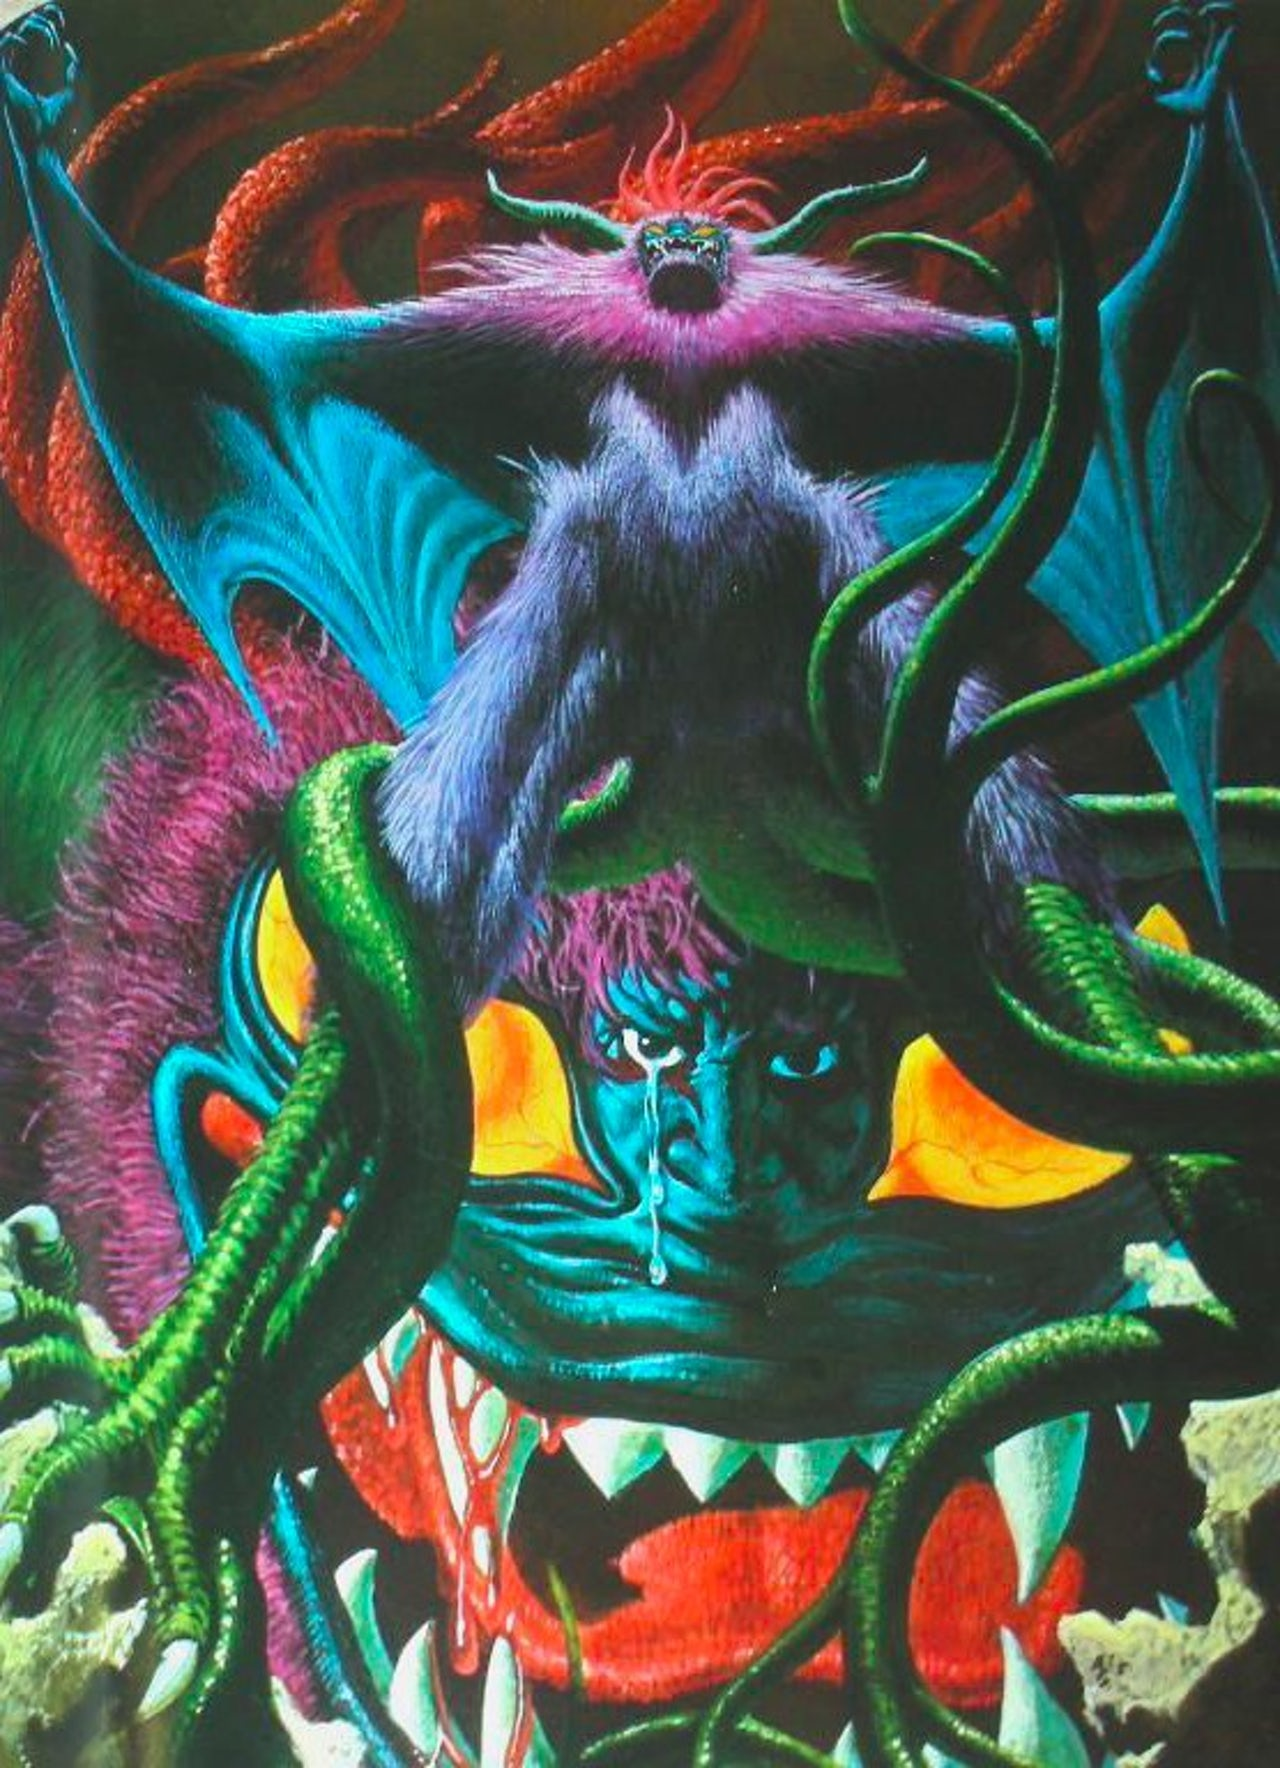 Go Nagai's Mao Dante (Demon Lord Dante)